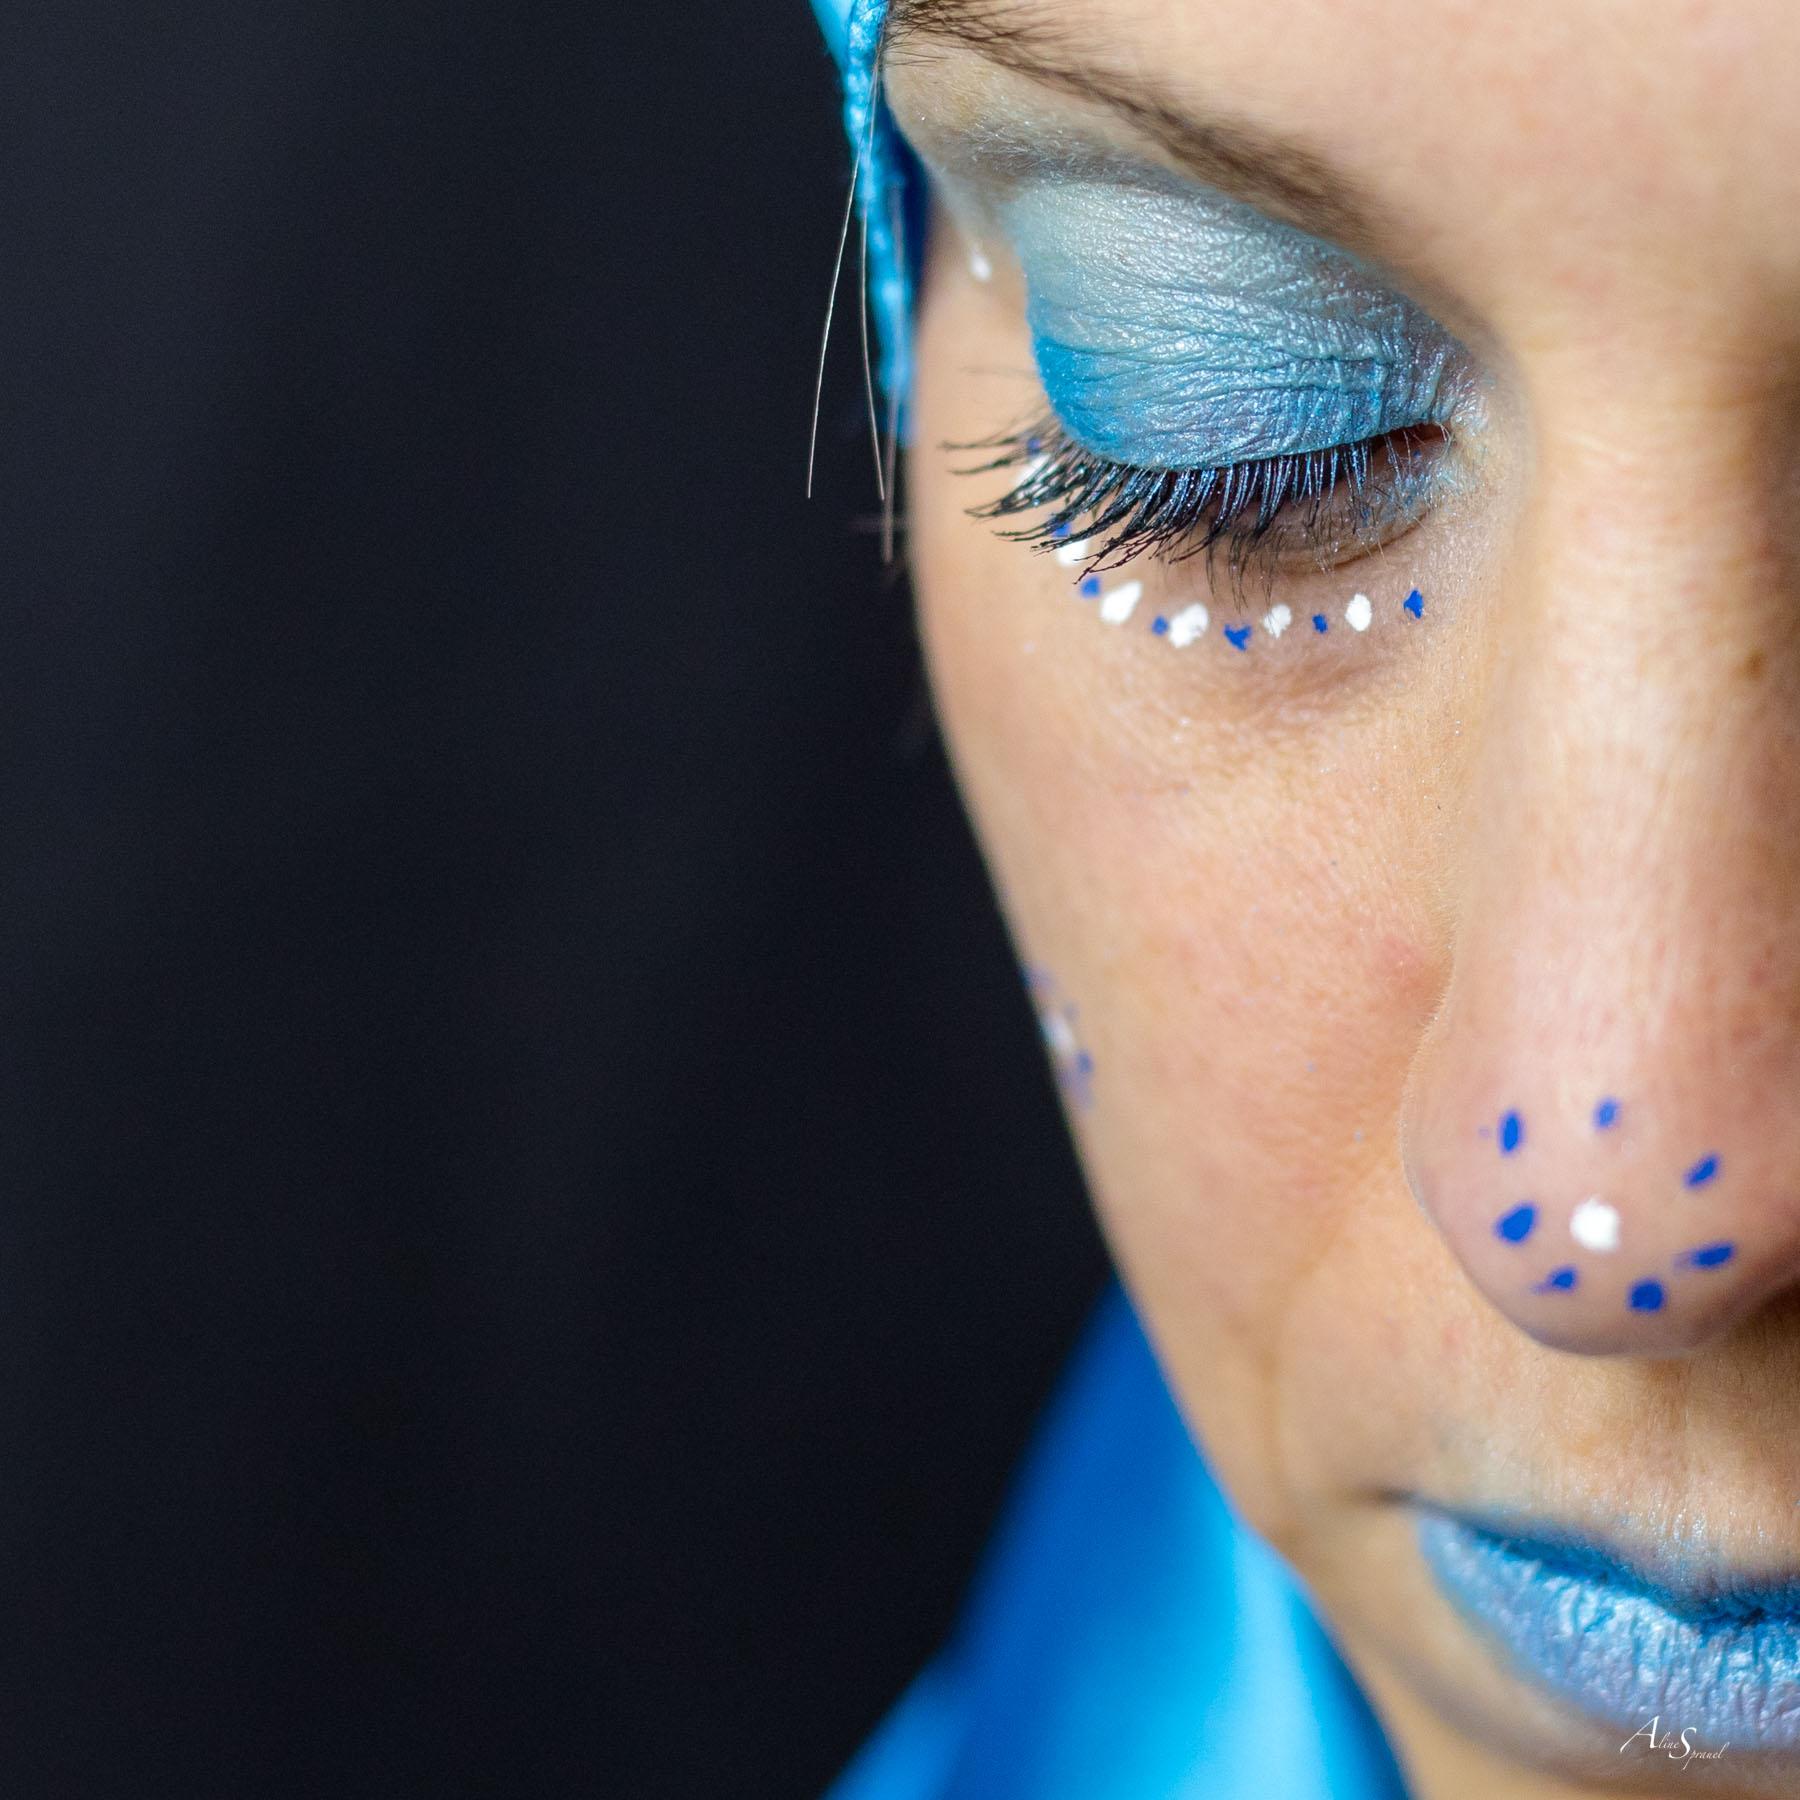 maquillage visage bleu